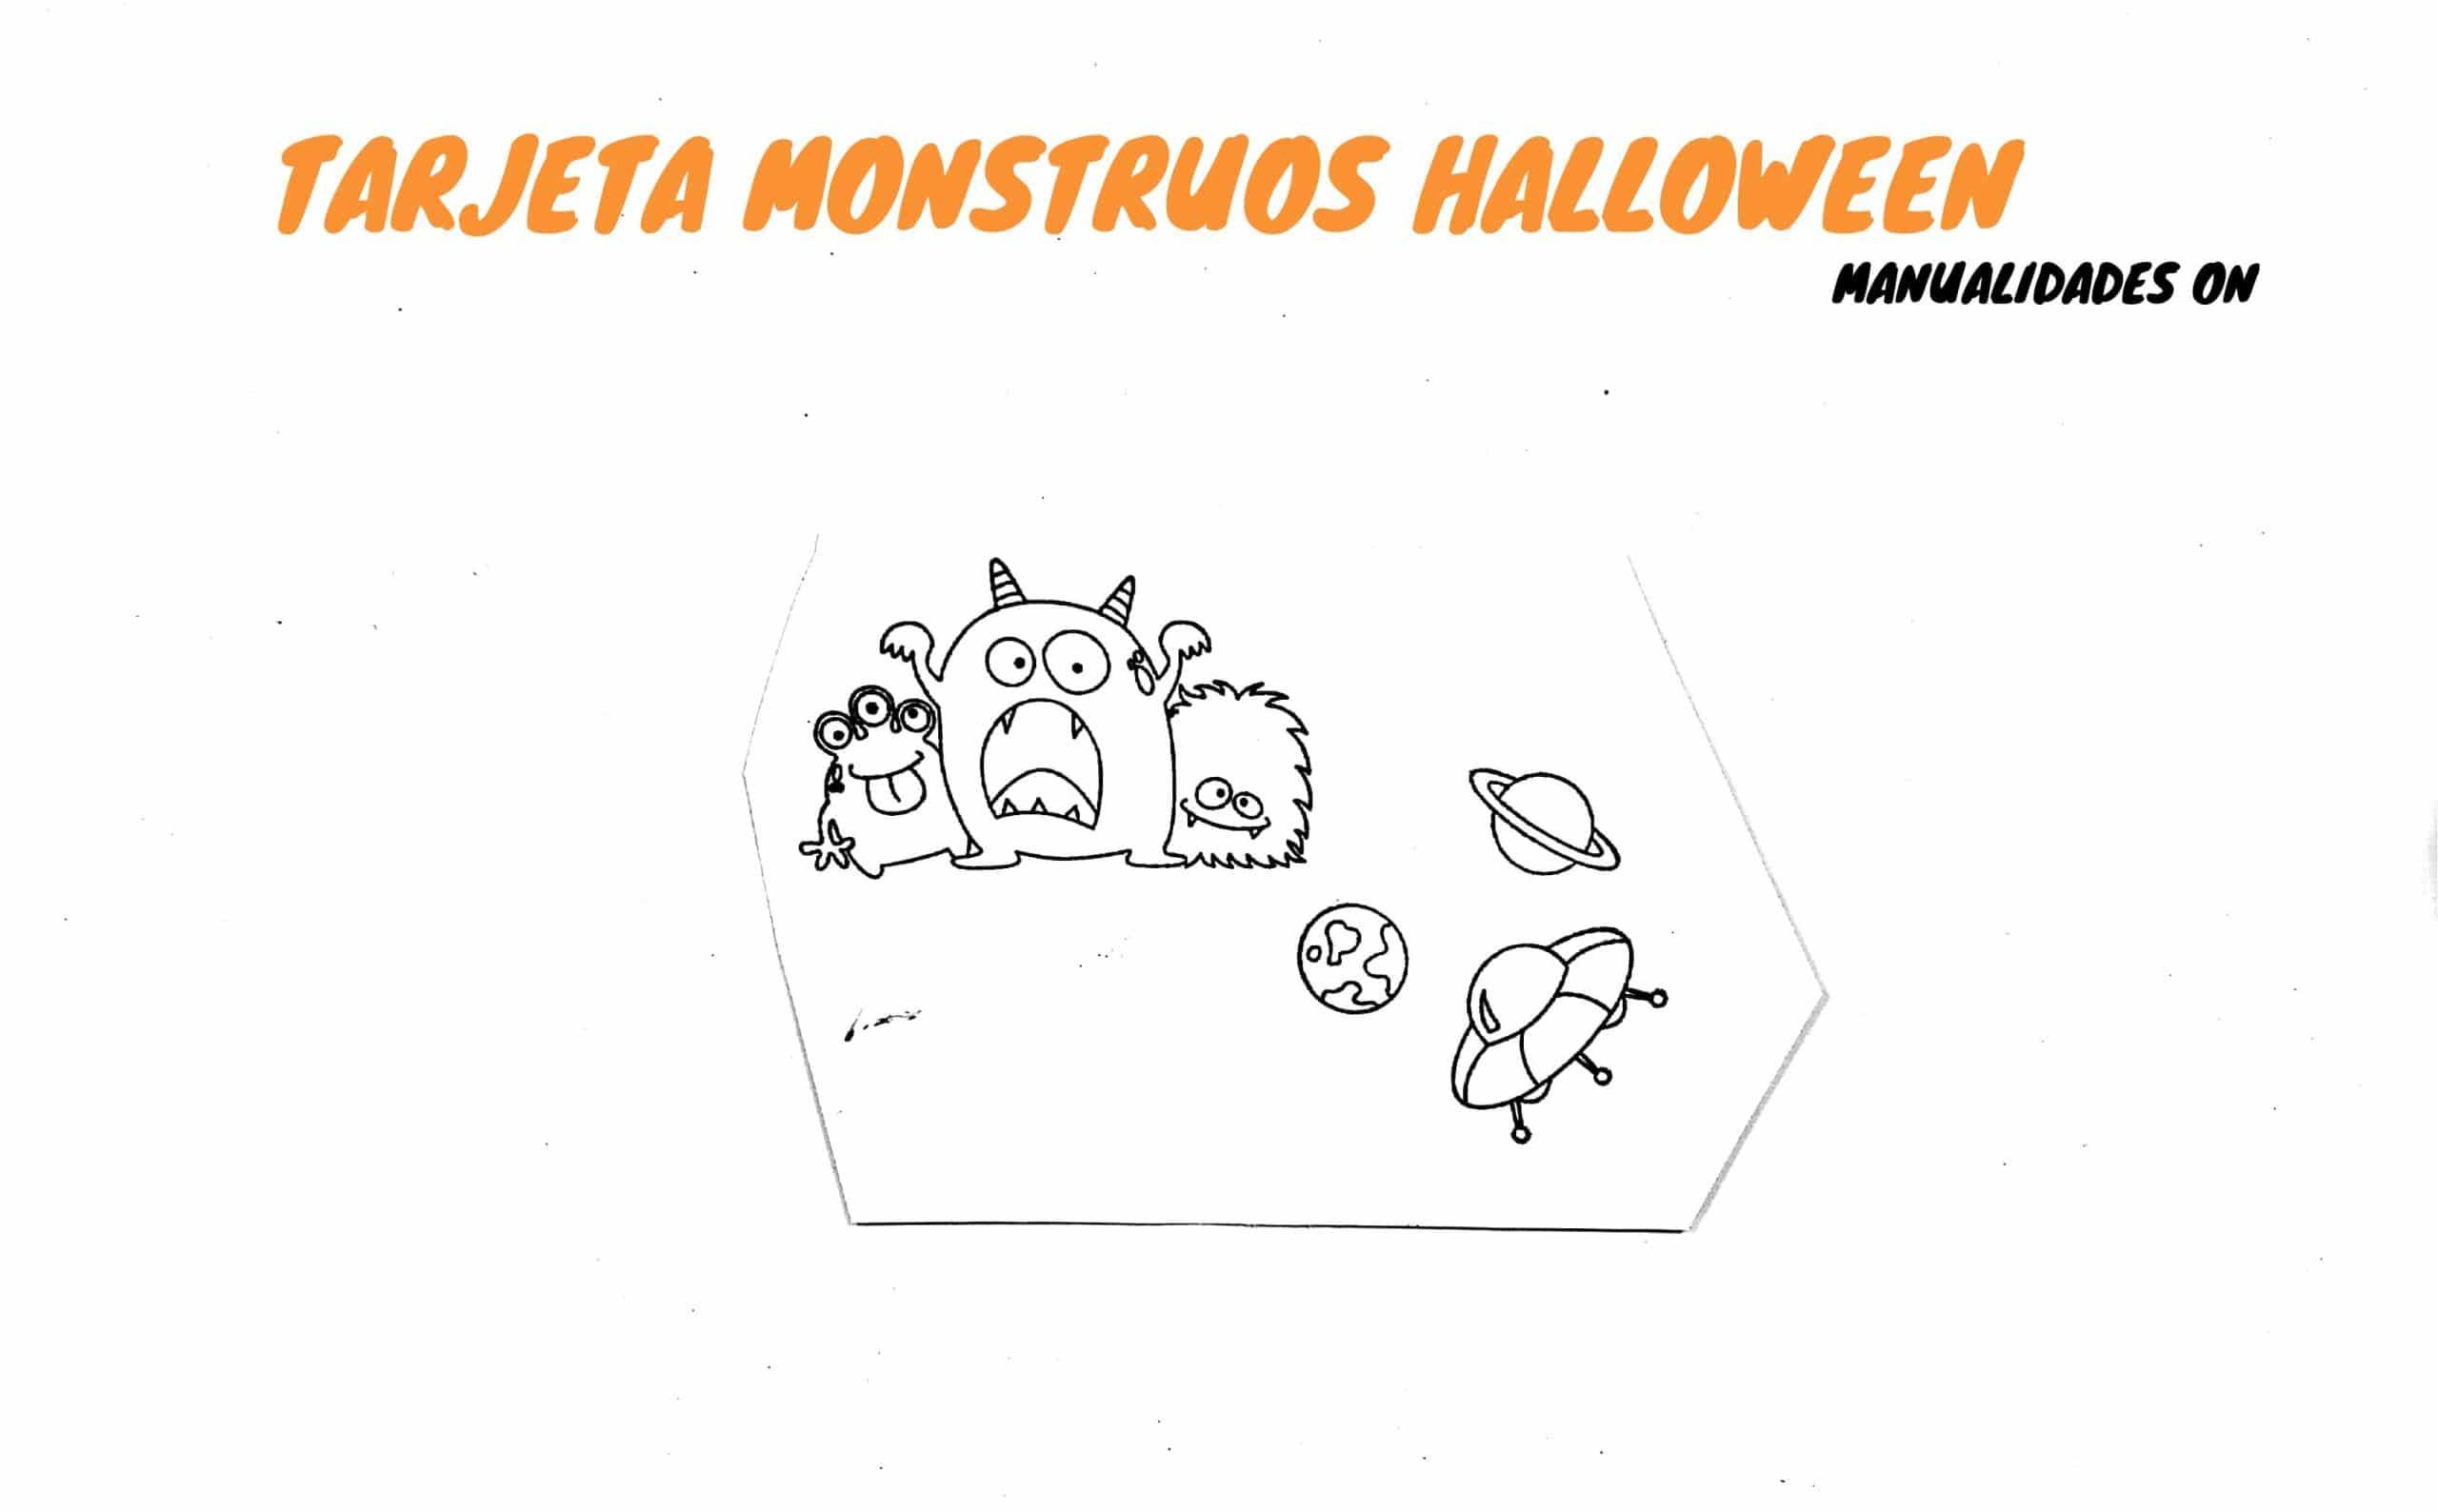 Tarjeta infantil de monstruos para celebrar Halloween